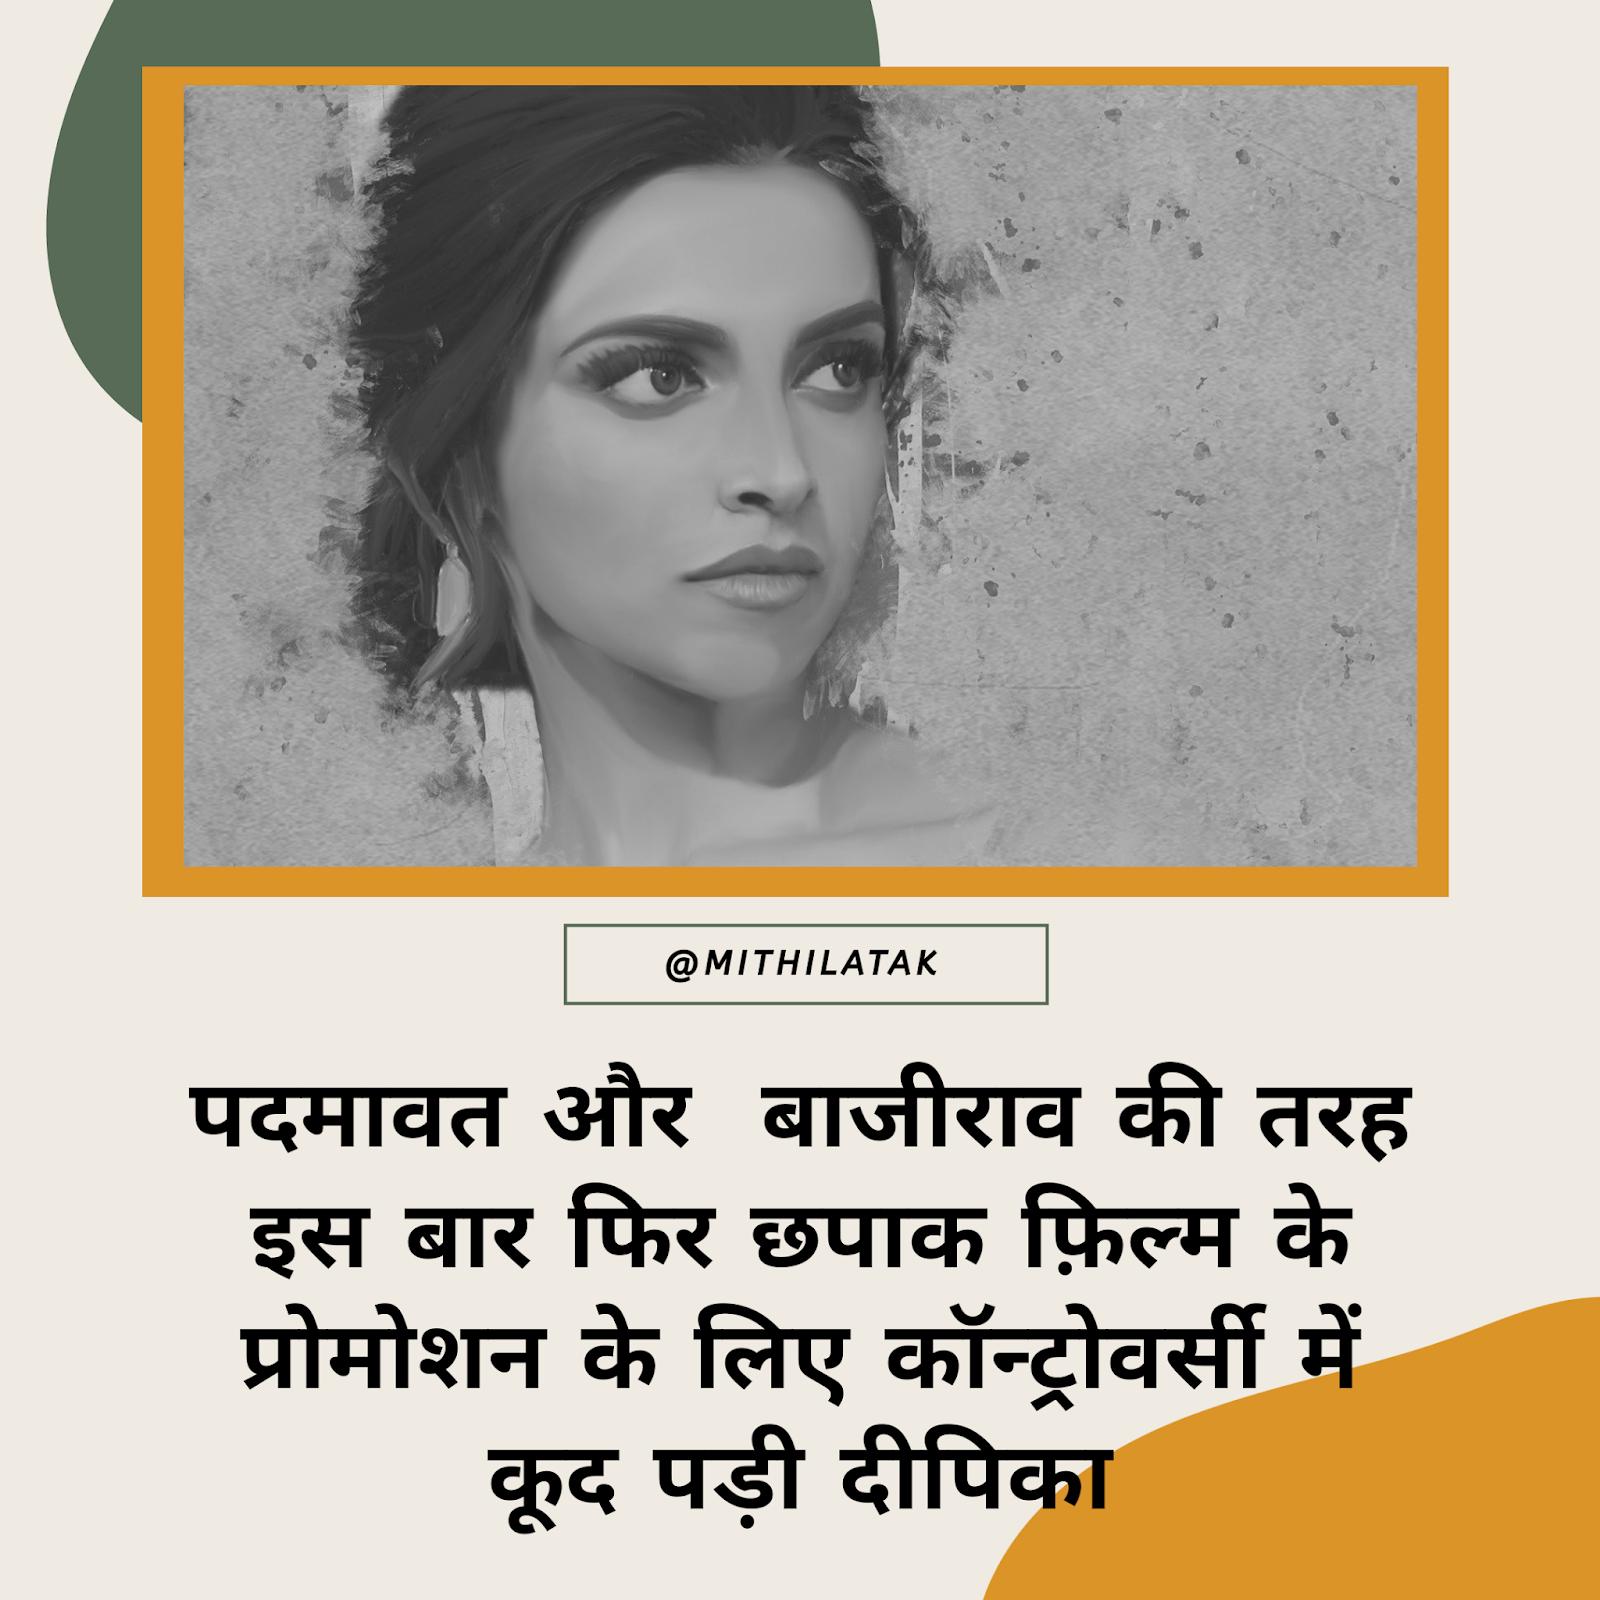 deepika, deepika padukone, films, chhapak, controversy deepika,